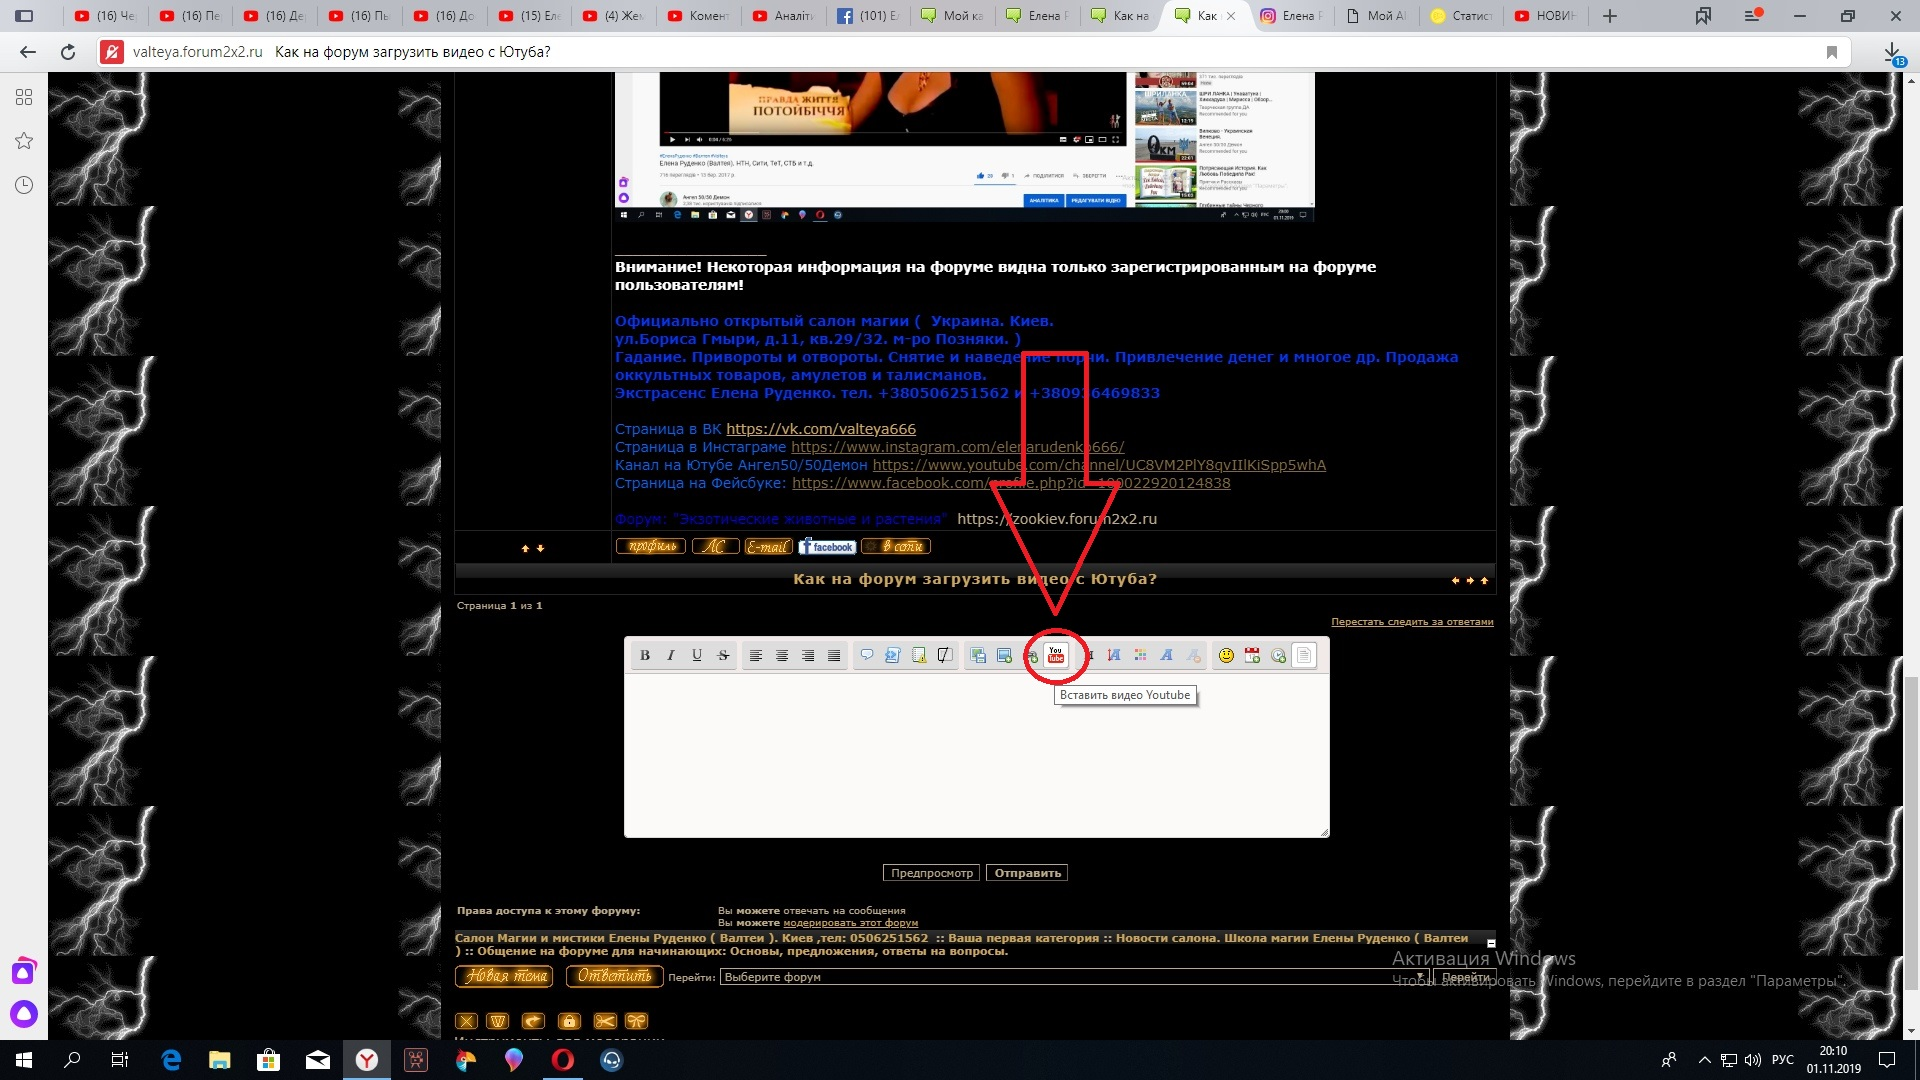 Как на форум загрузить видео с Ютуба?  4_qjA3QWkwg